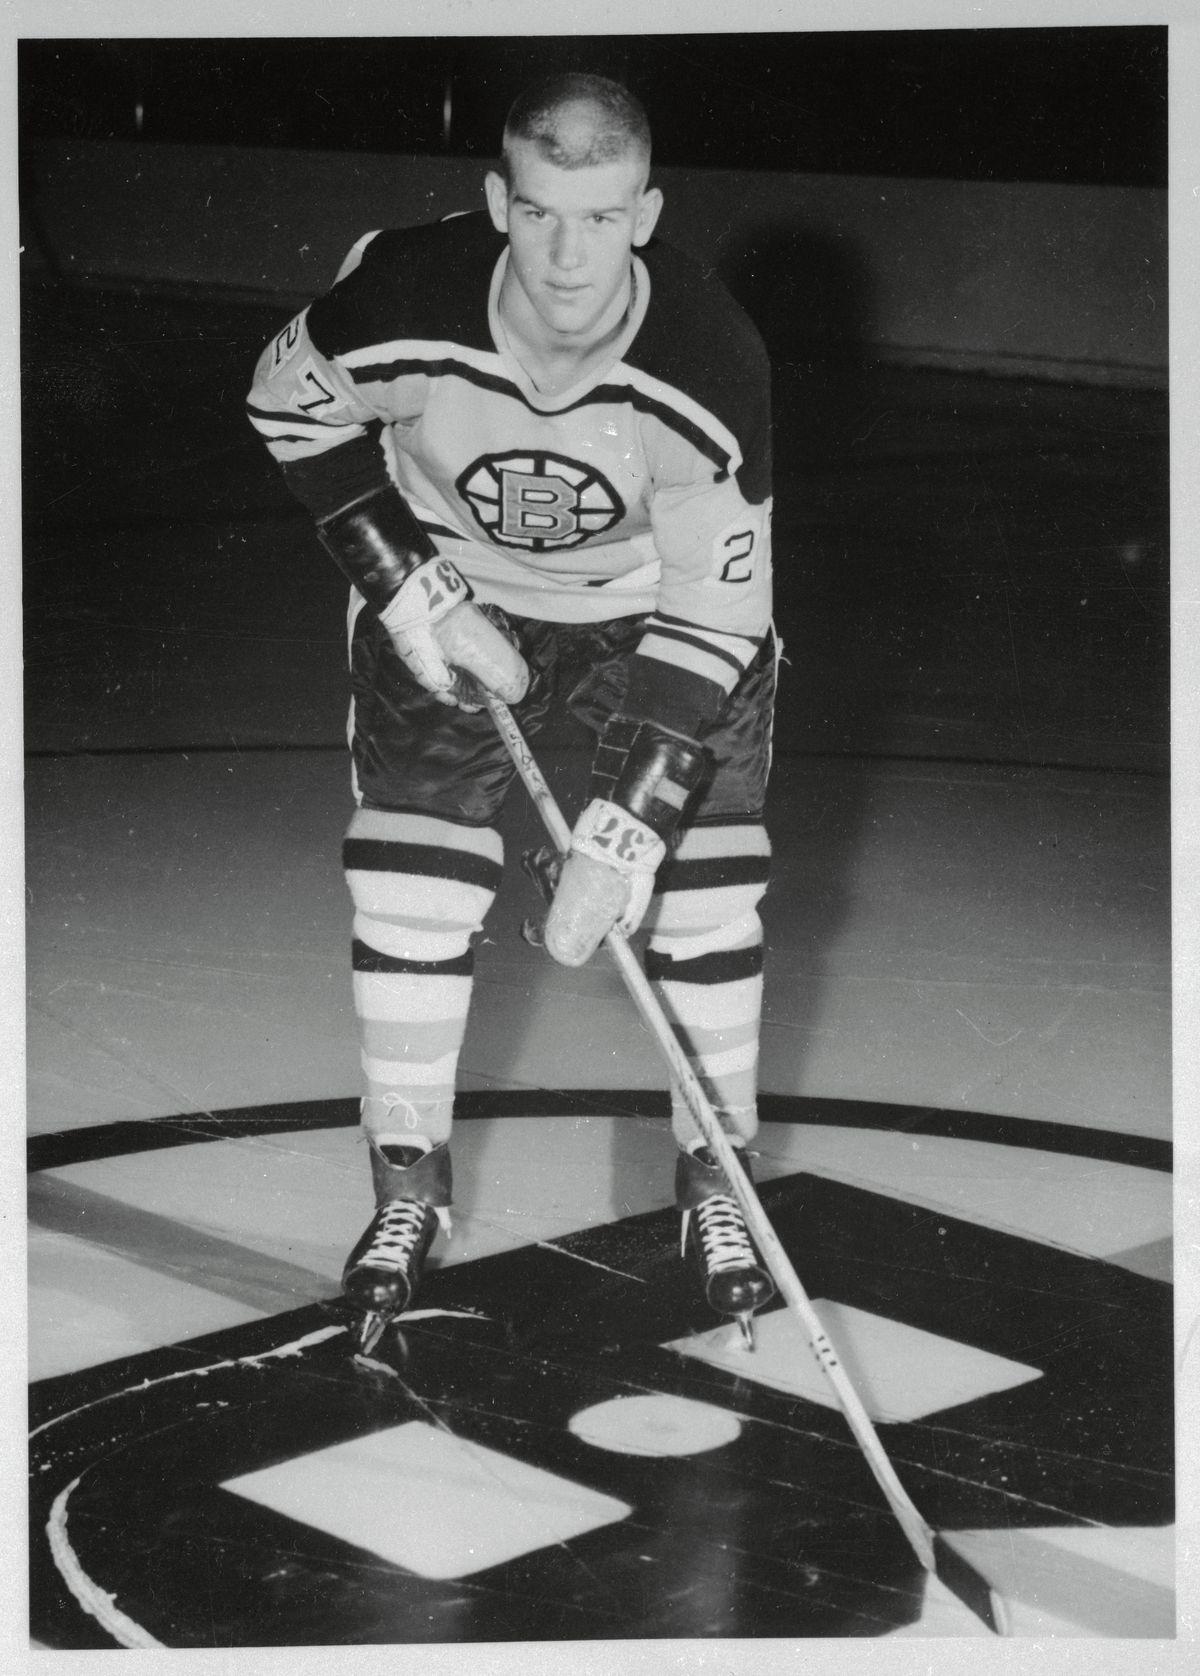 Bobby Orr Holding Hockey Stick in Position